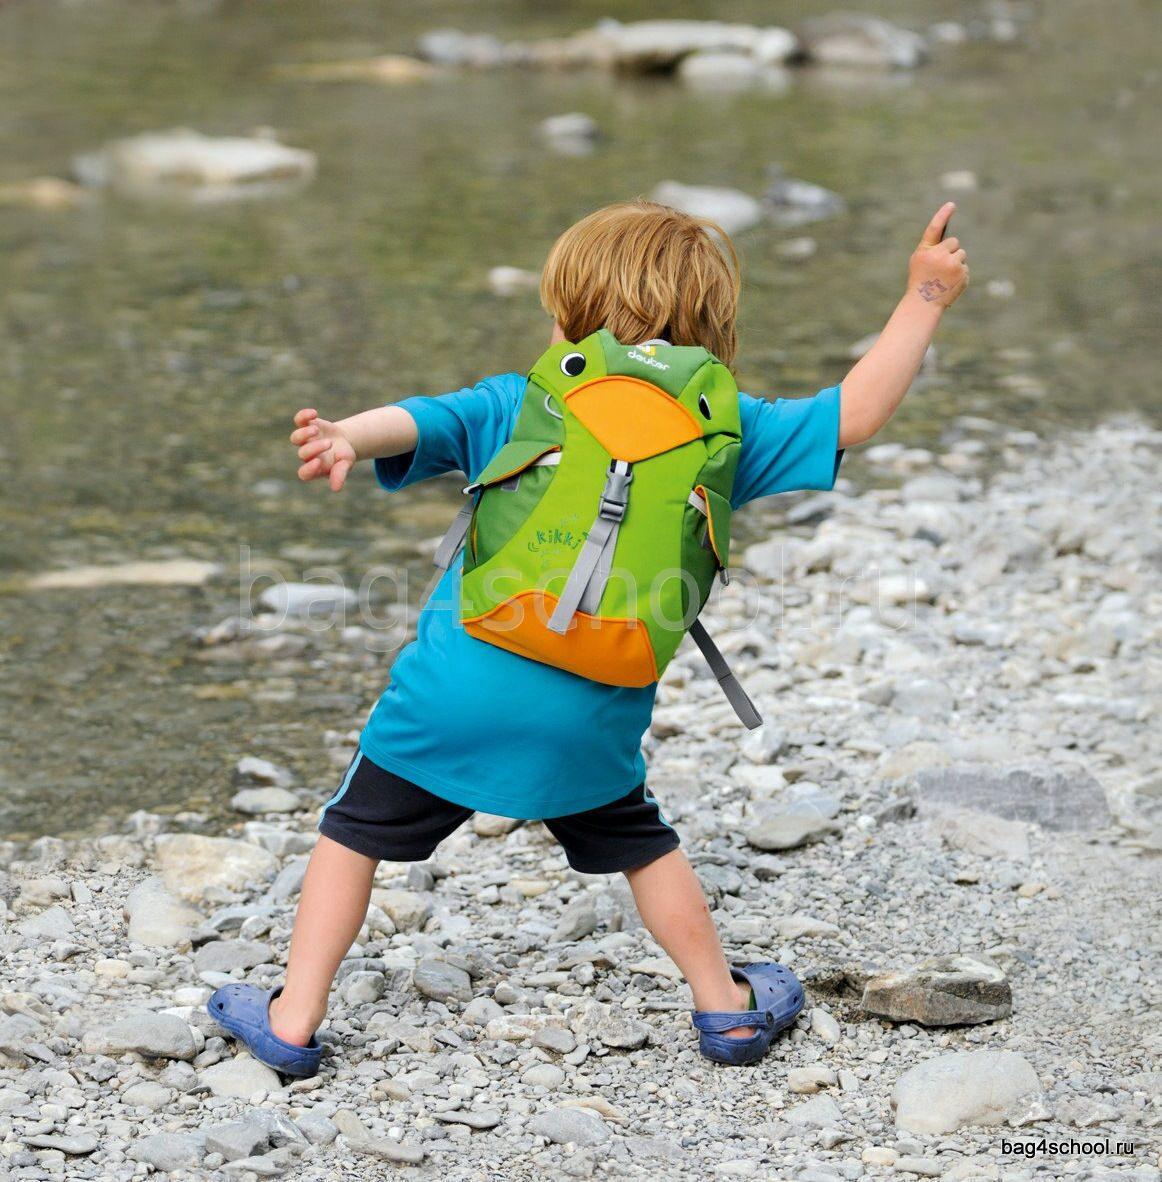 Детский рюкзак Deuter Kikki - Magenta Blackberry 36093-5505-1